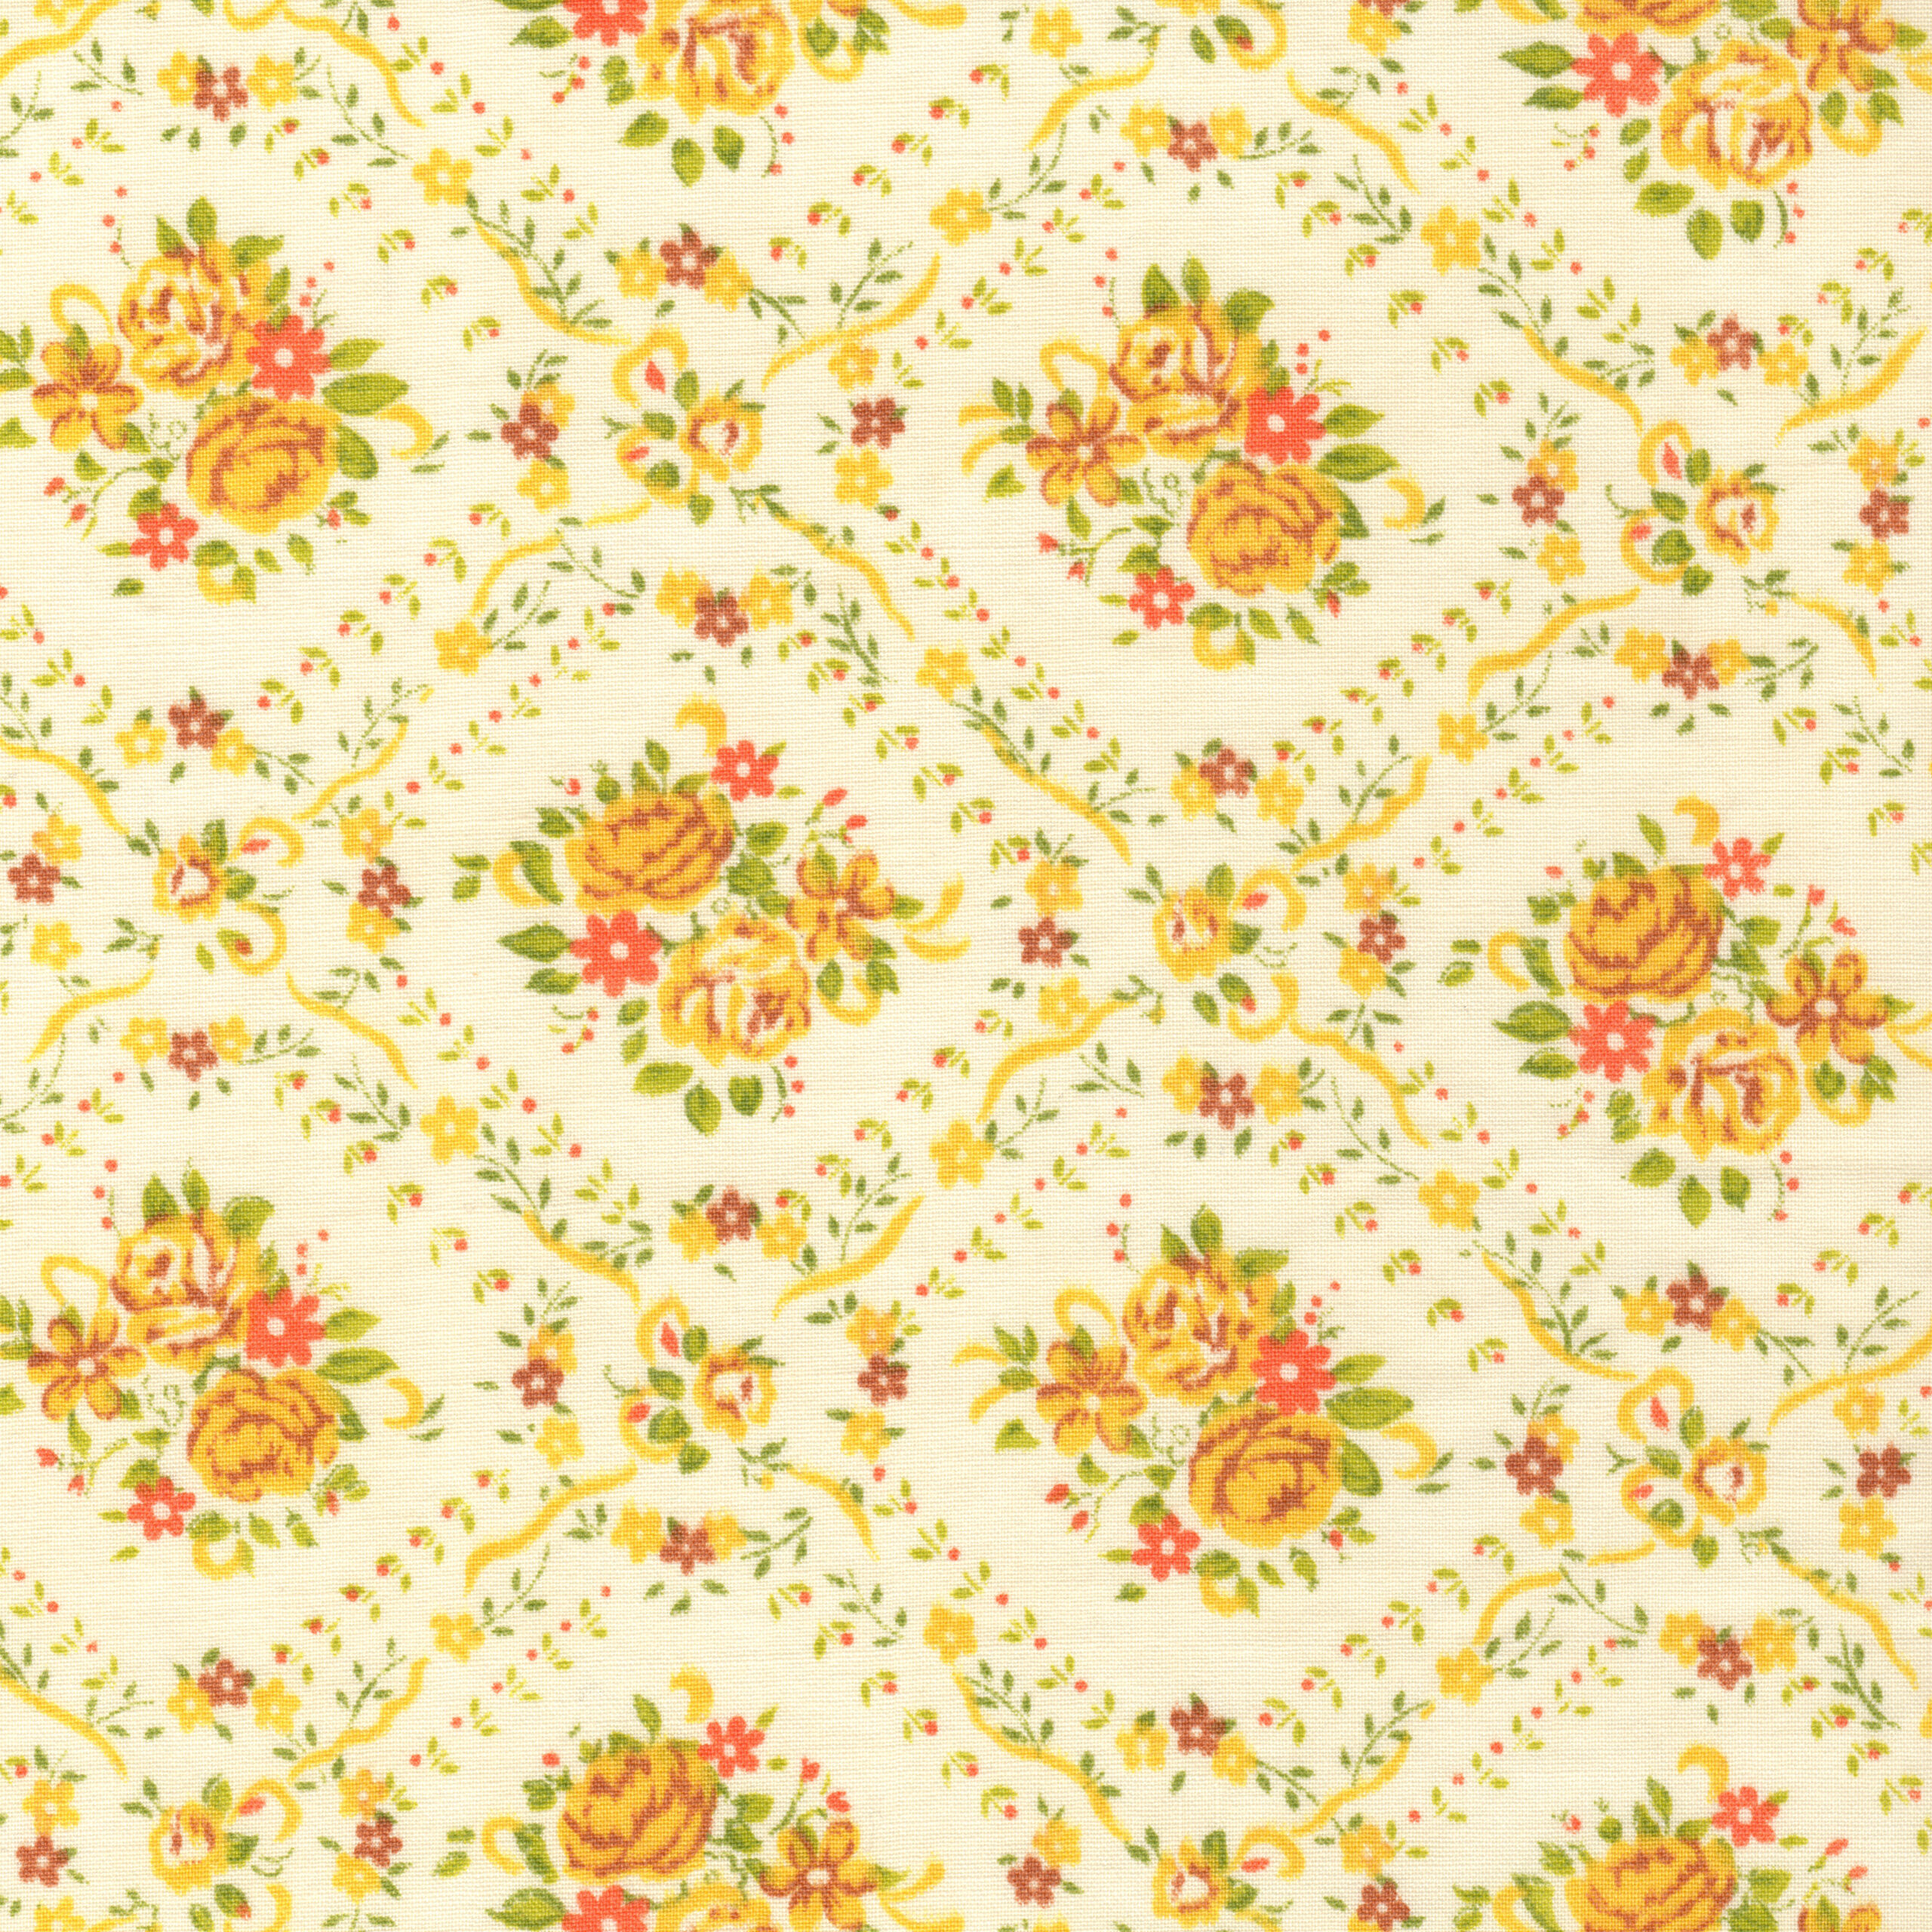 Paper: Free Floral Autumn 12 x 12 Digital Scrapbooking - Free Pretty ...